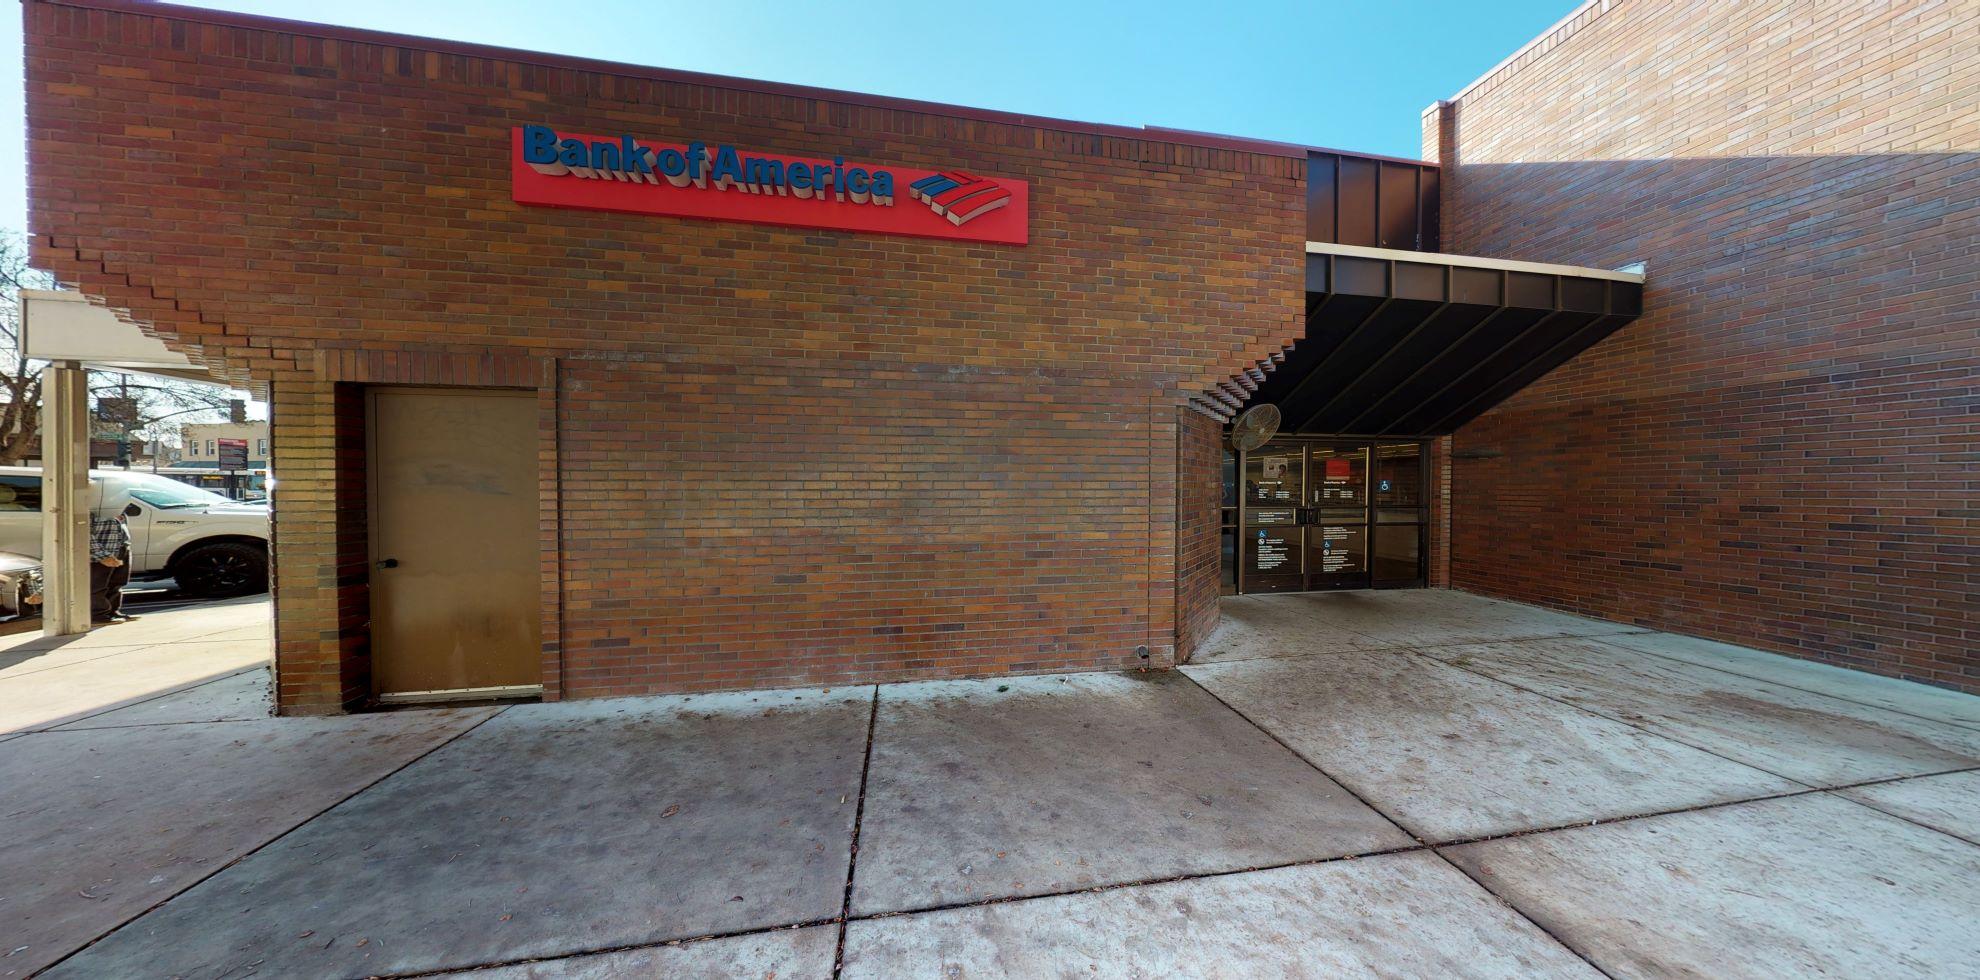 Bank of America financial center with walk-up ATM | 2154 MacArthur Blvd, Oakland, CA 94602